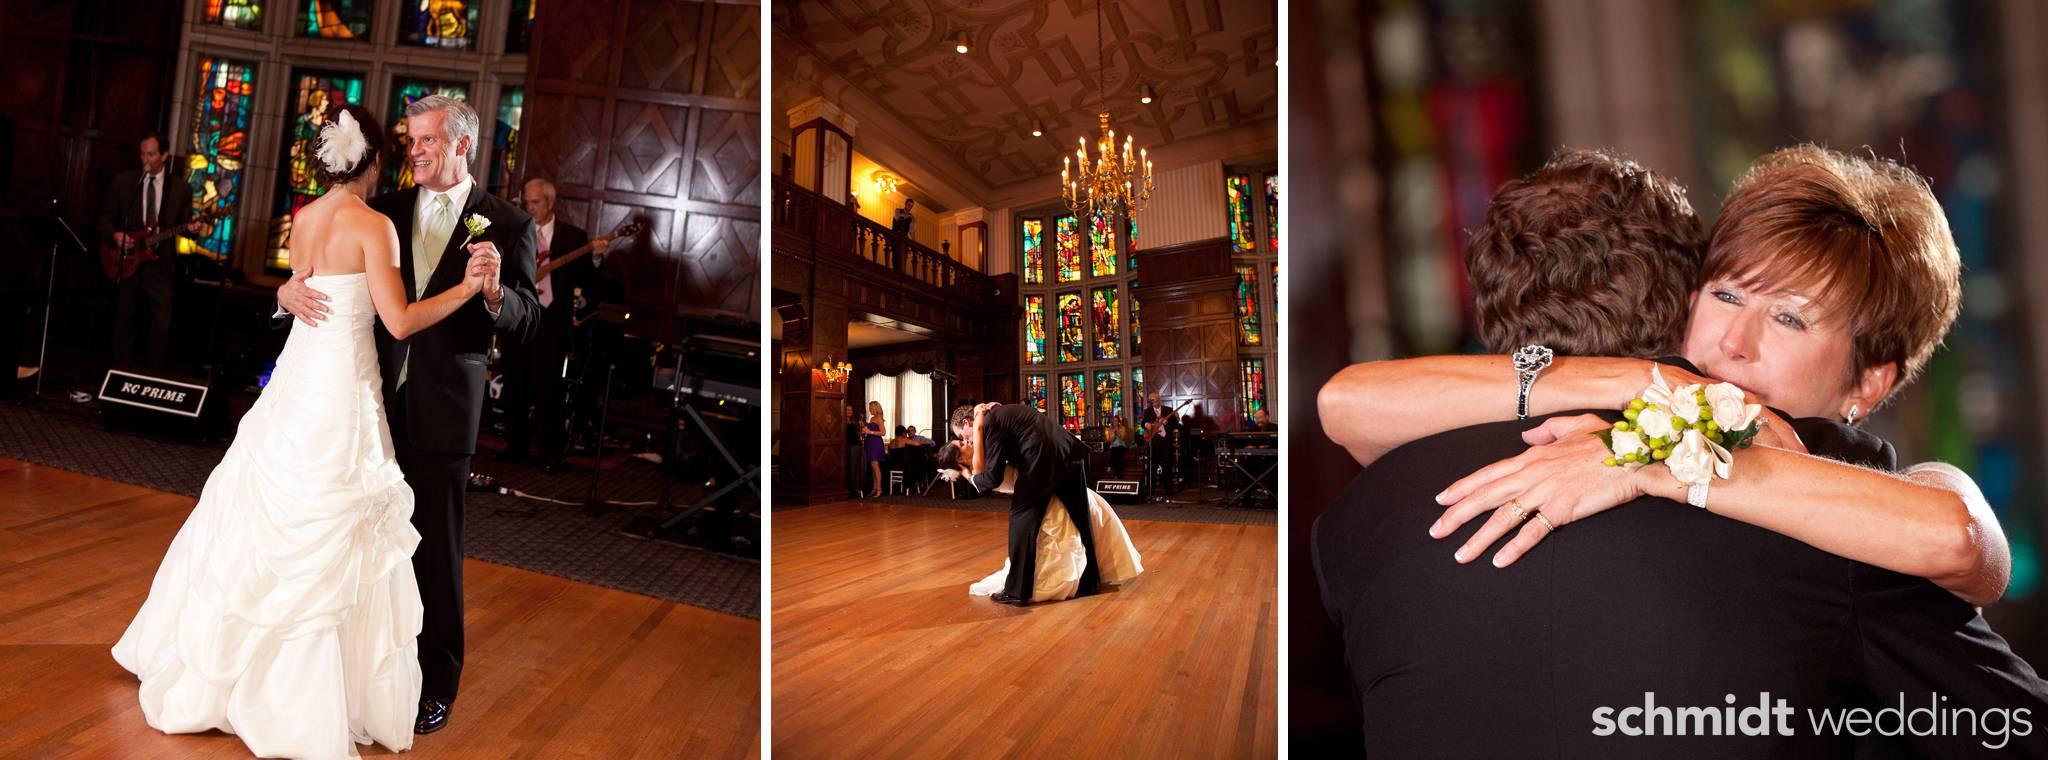 Best wedding photographer chicago and kansas city tom schmidt